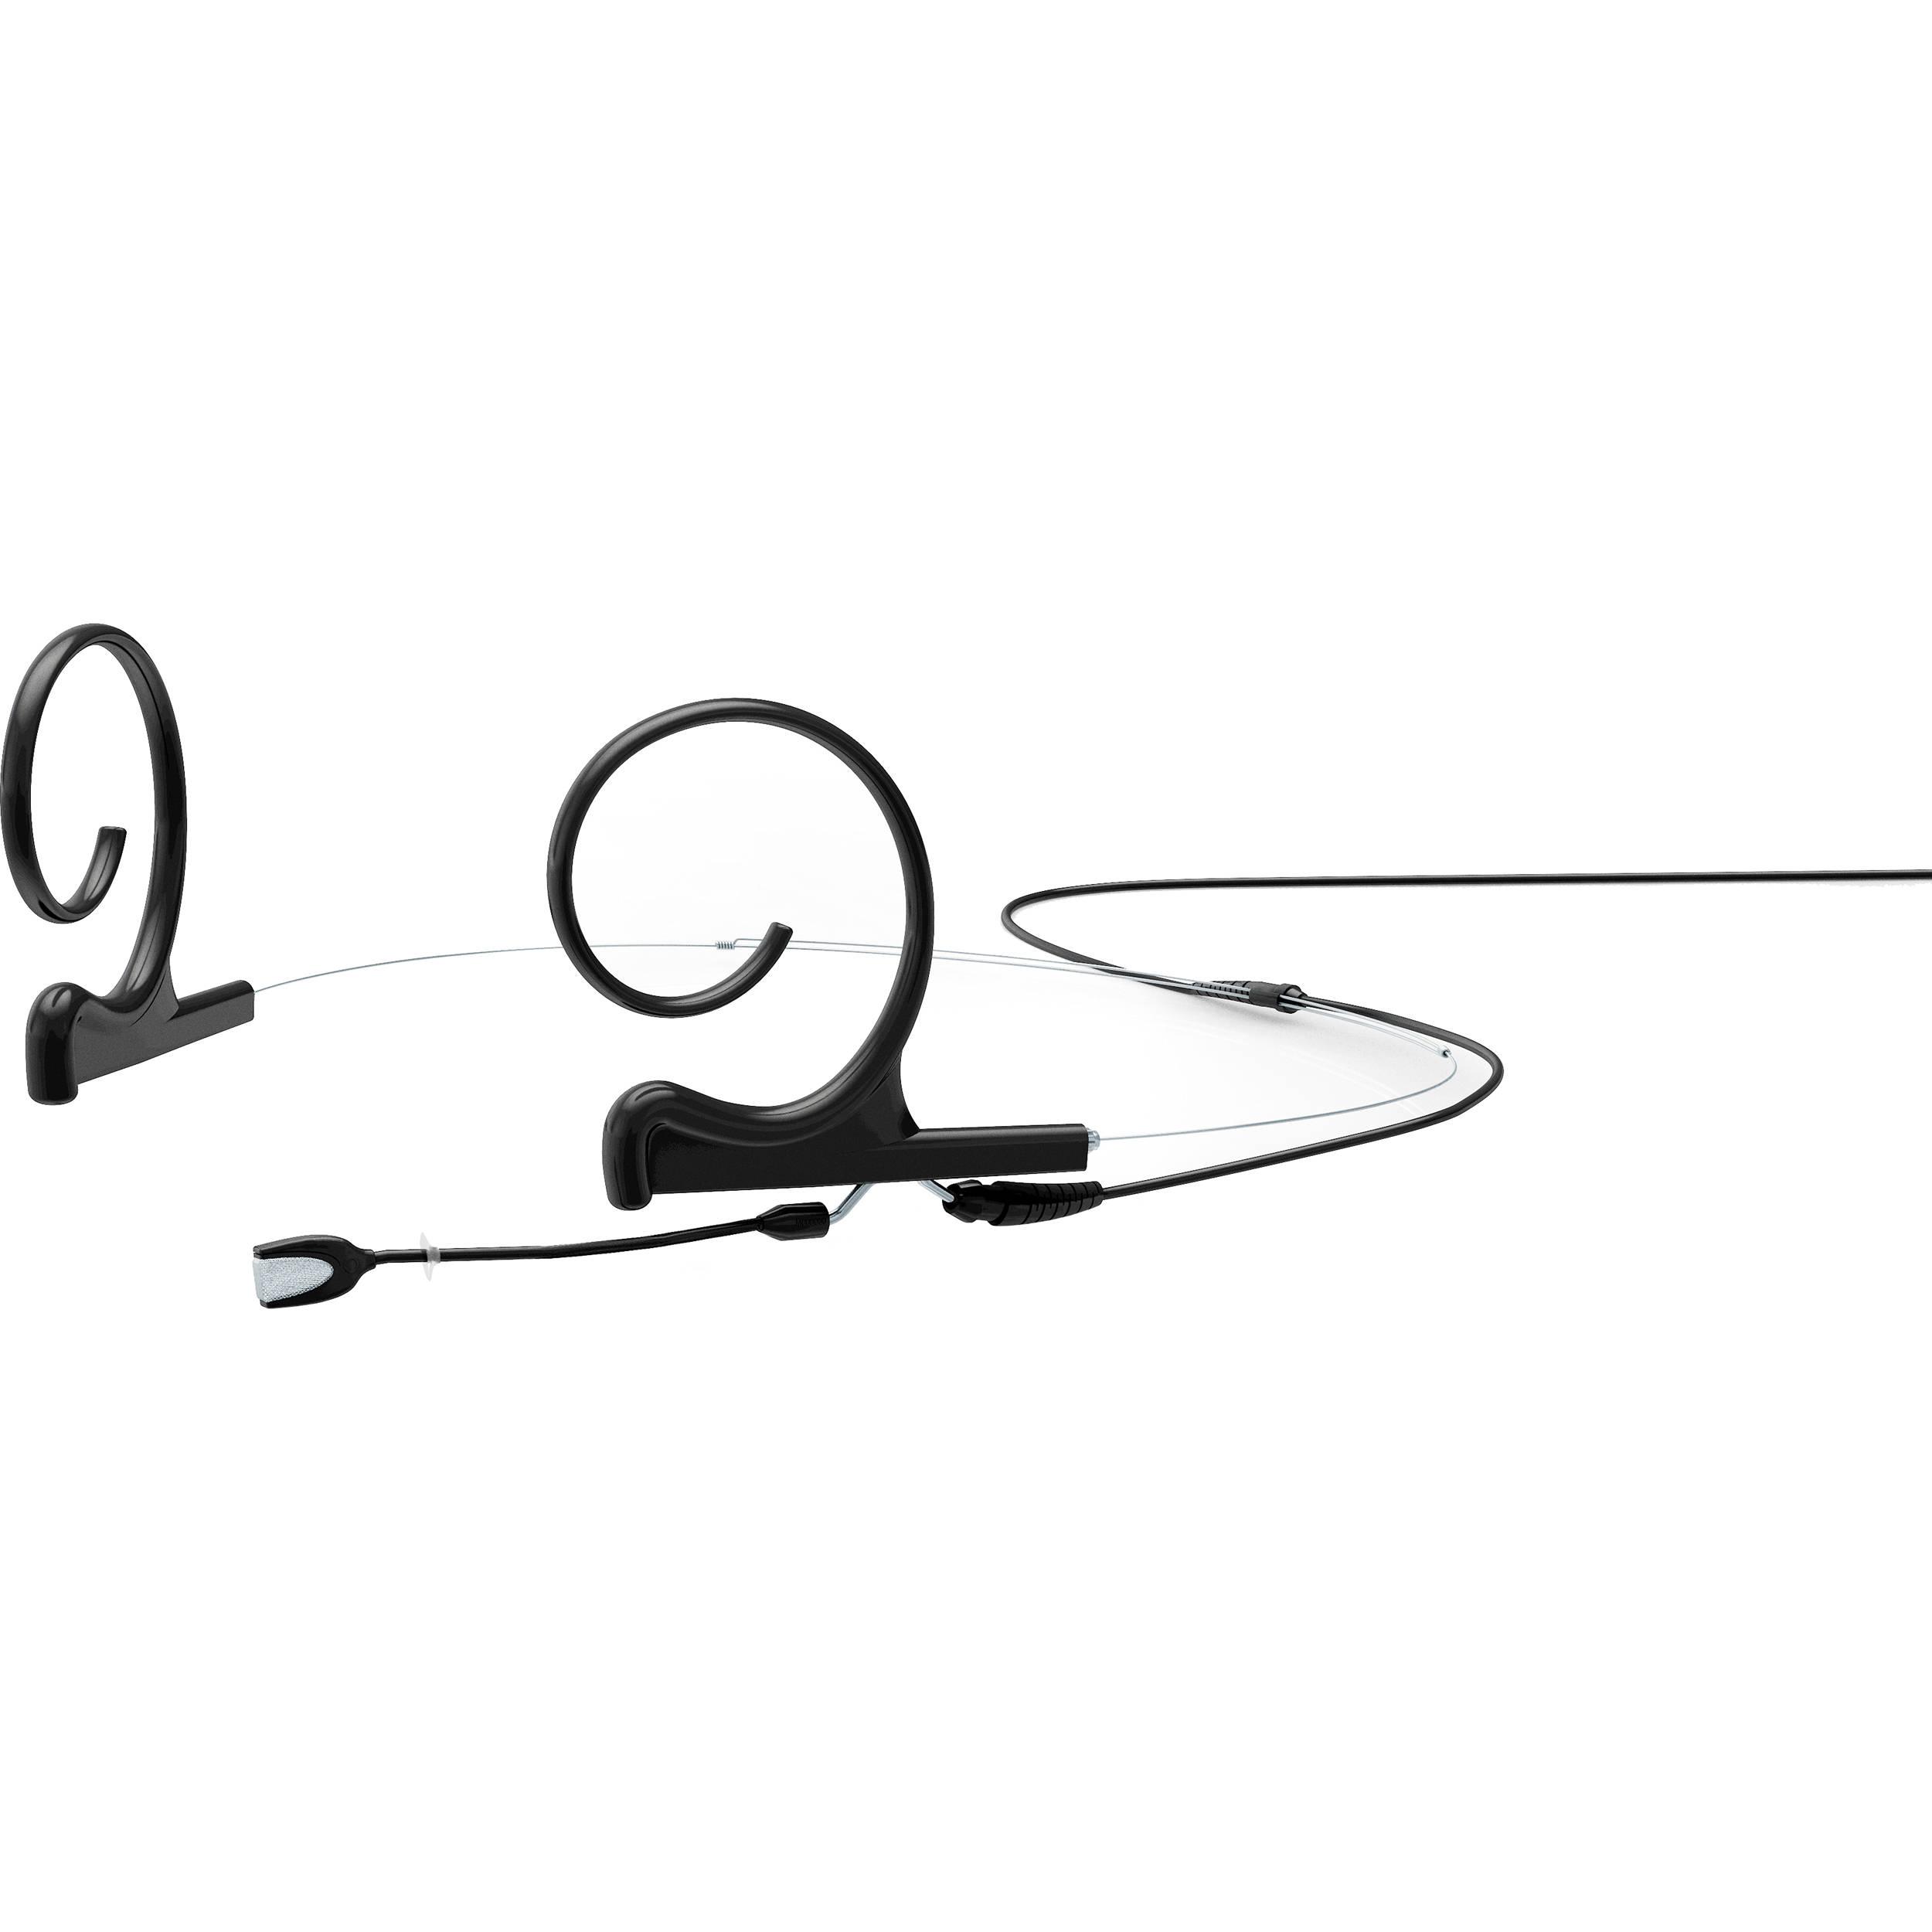 Dpa Microphones D Fine Dual Ear Headset Fioba34 S2 B Amp H Photo